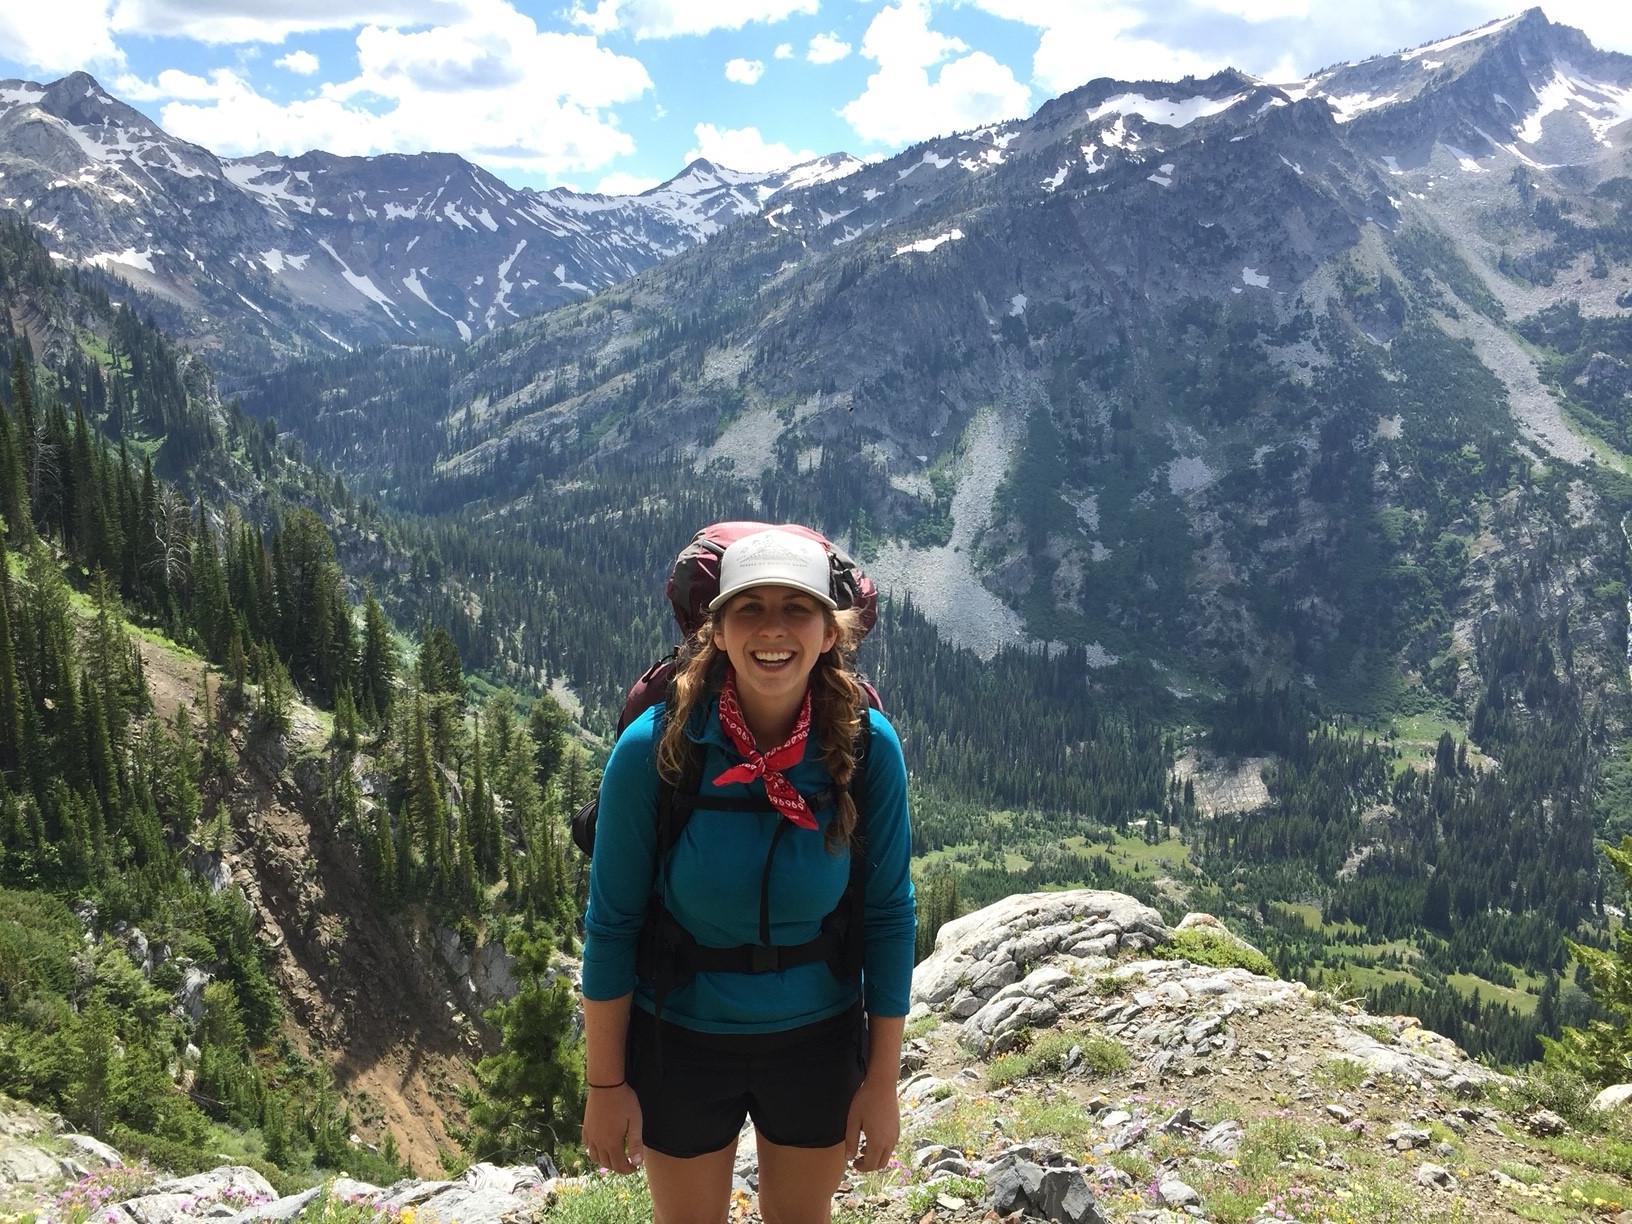 Hilary Sager hiking Oregon's mountains